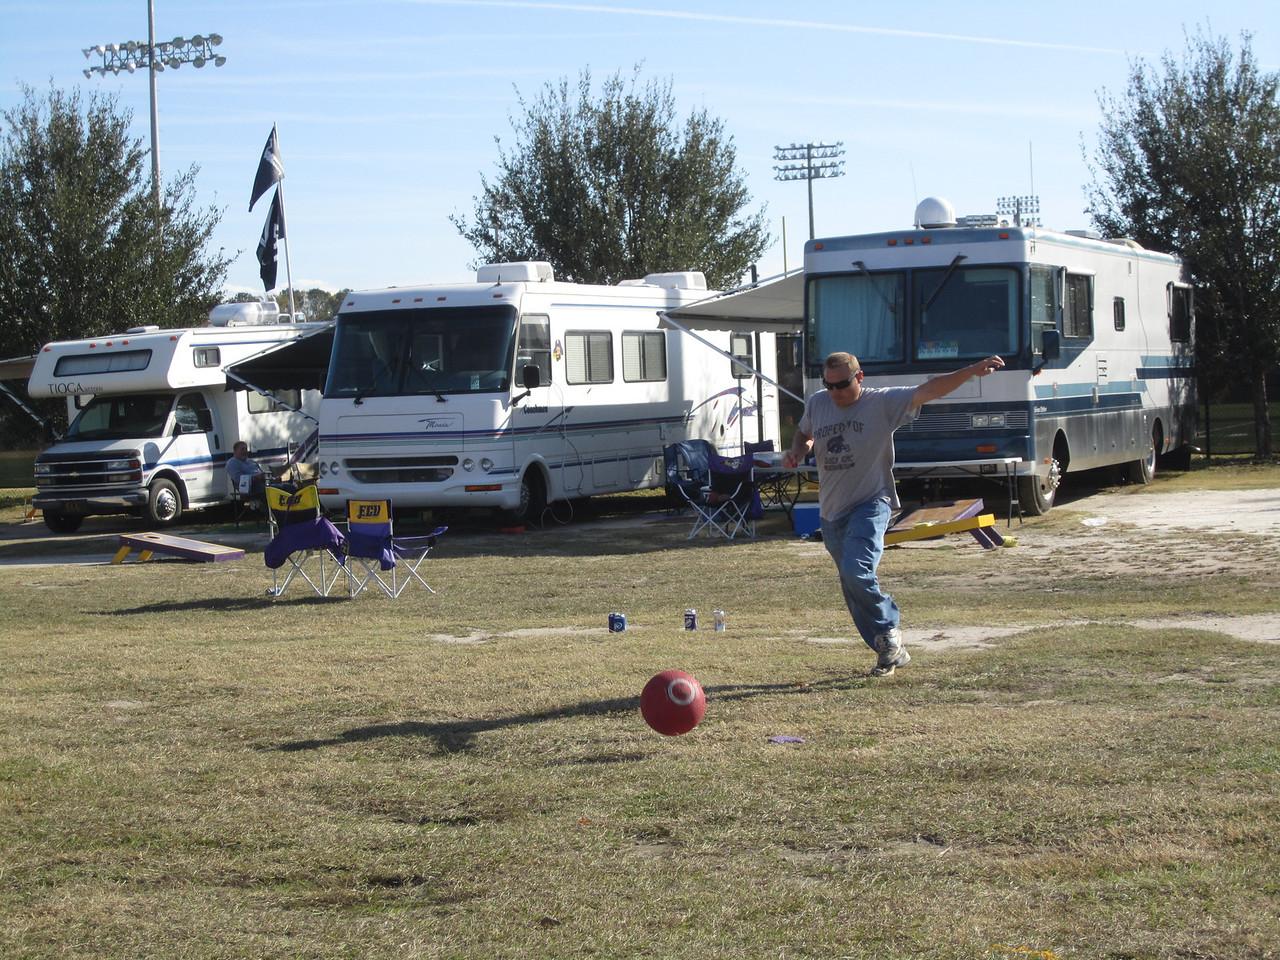 11/19/2011 ECU vs University of Central Florida - JG playing kickball